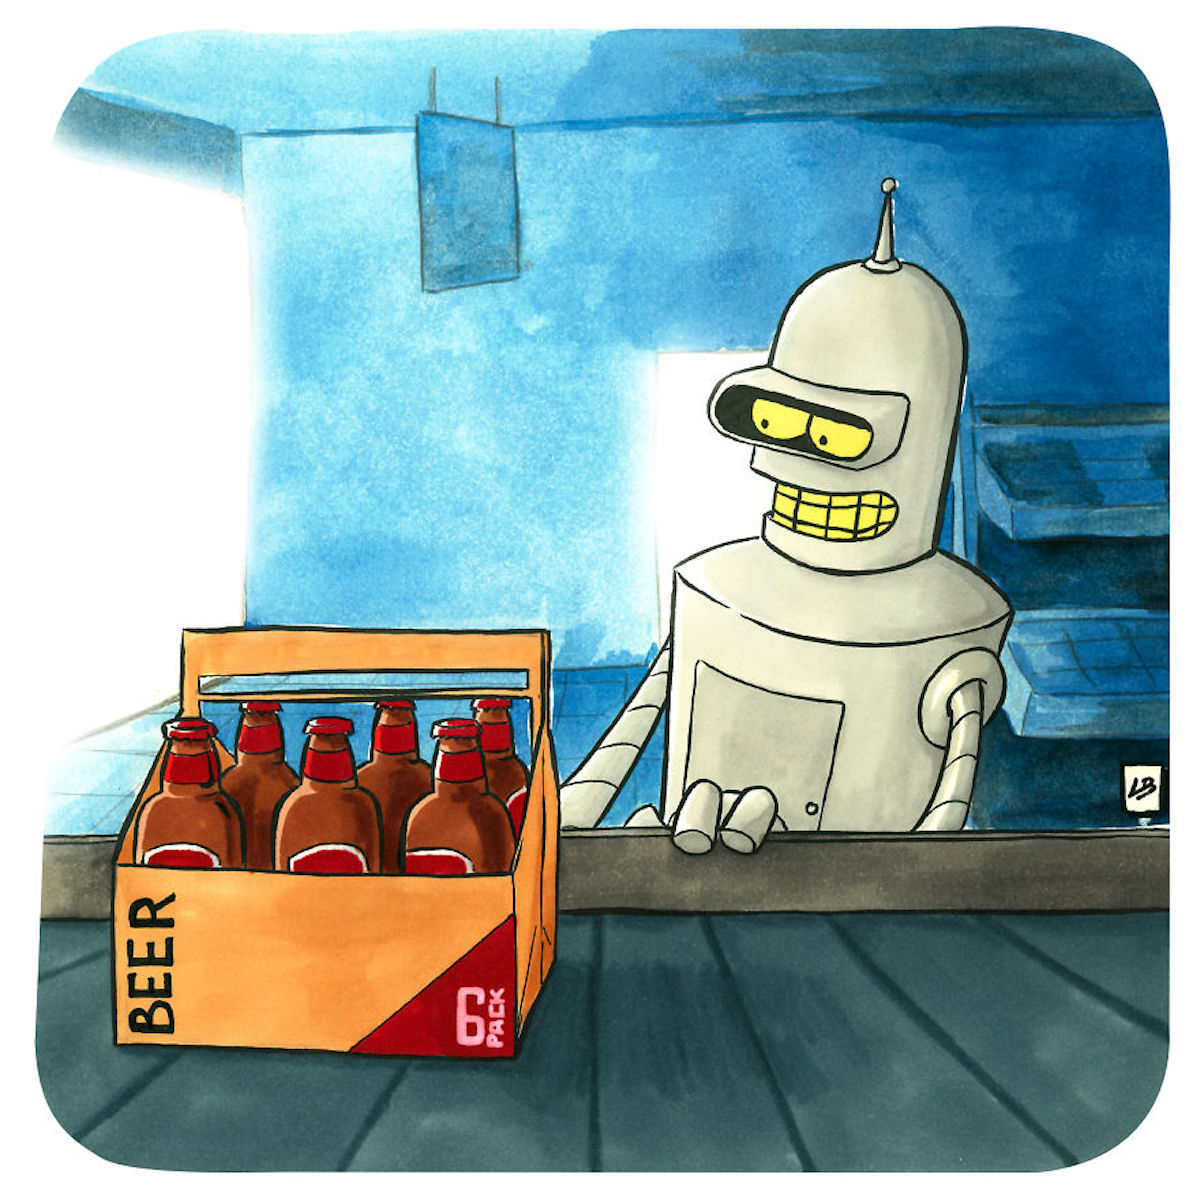 Bender bières Linda Bouderbala